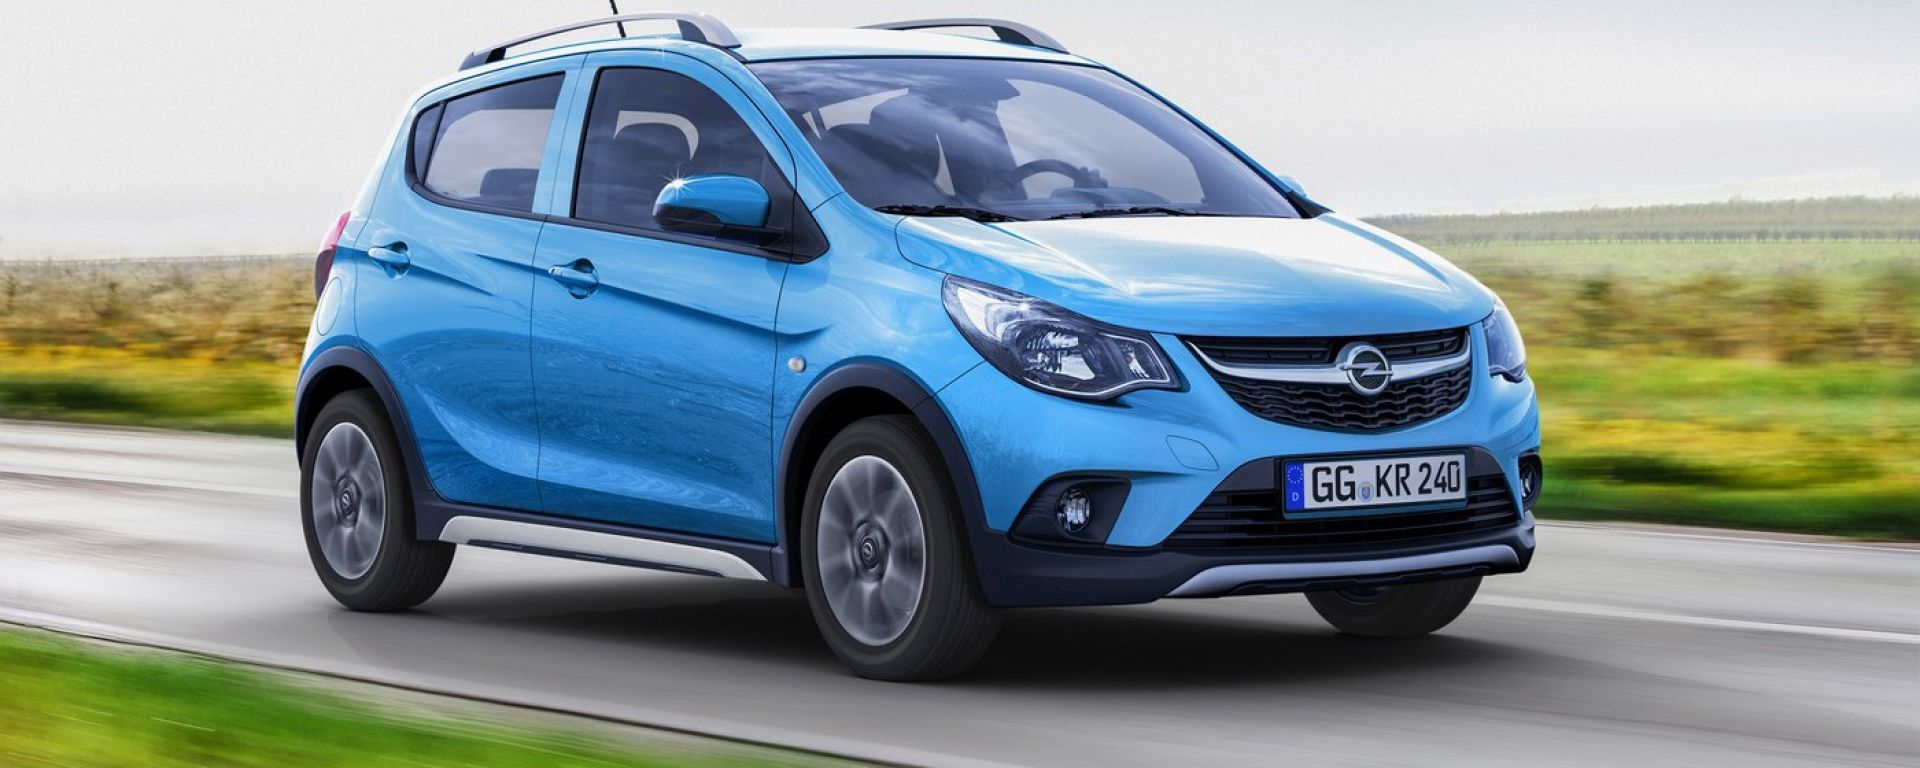 Opel Karl Rocks, la piccola tedesca si rinforza